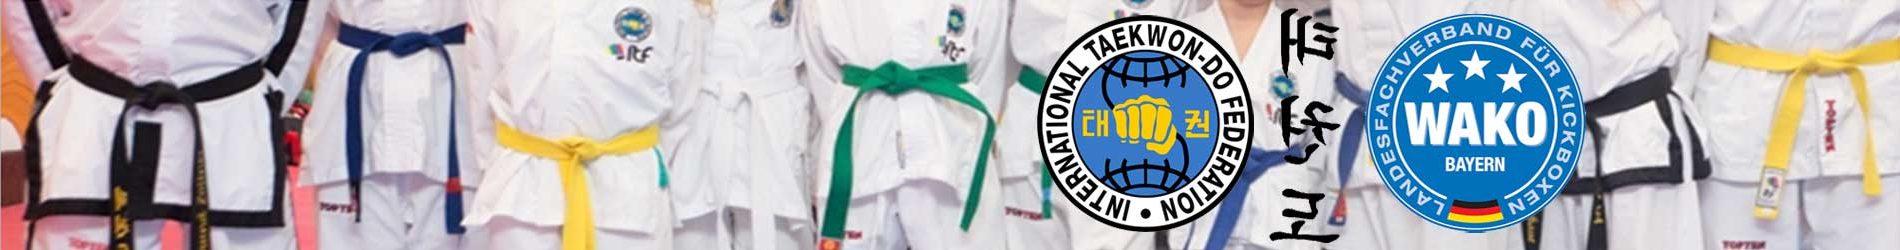 Taekwon-Do & Kickboxen